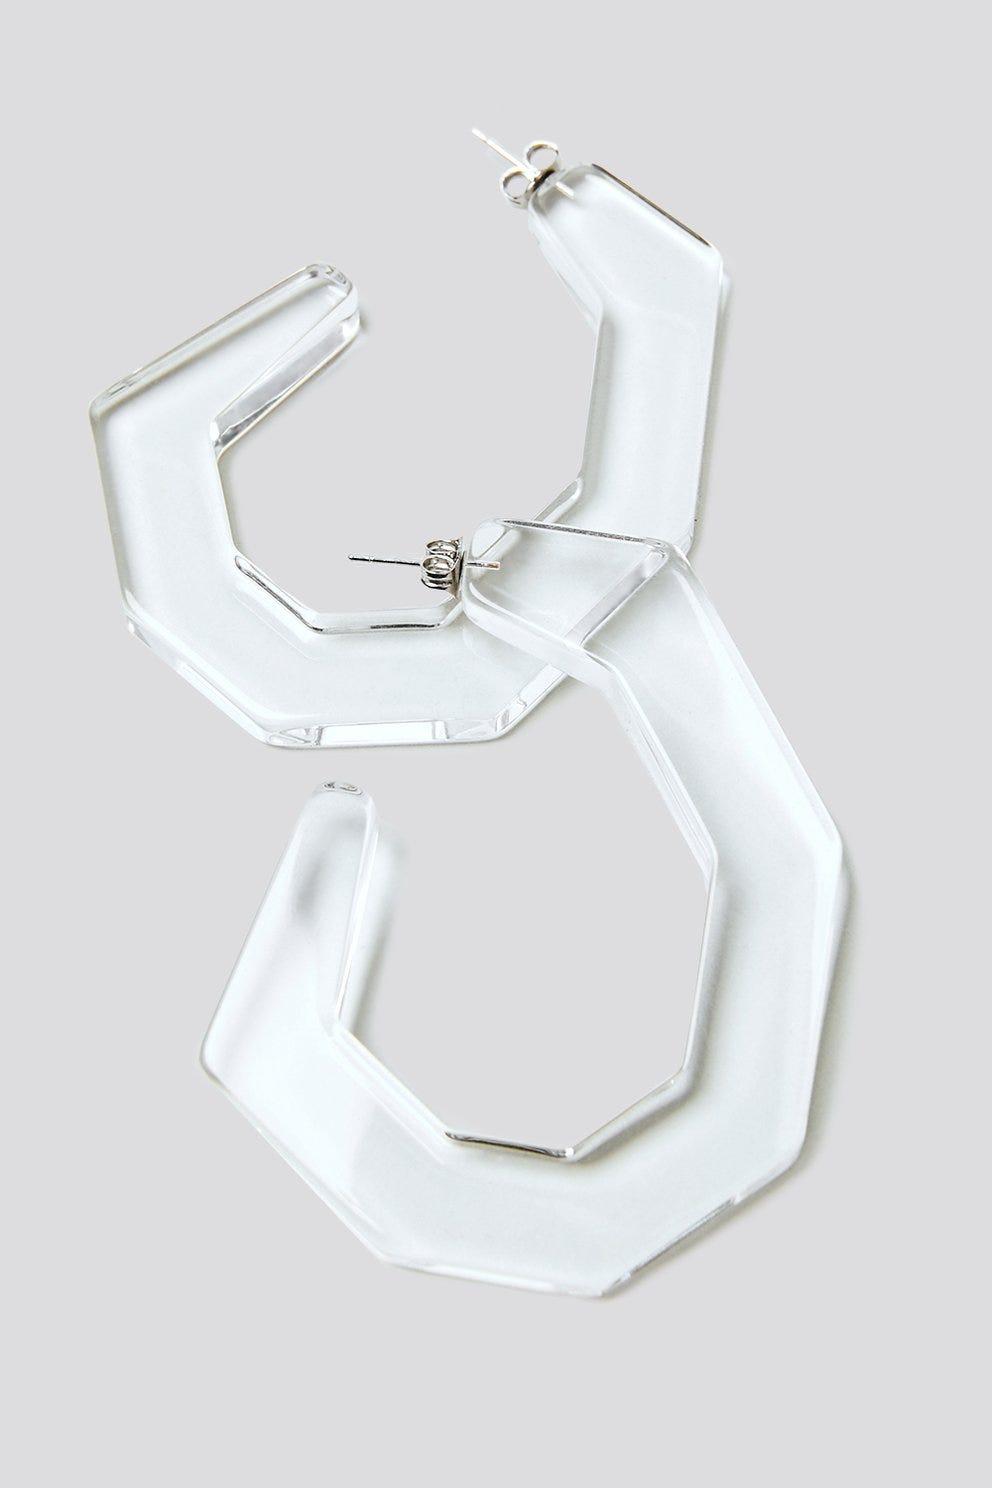 Clear Lucite Plastic Hoop Earrings For Summer 2018